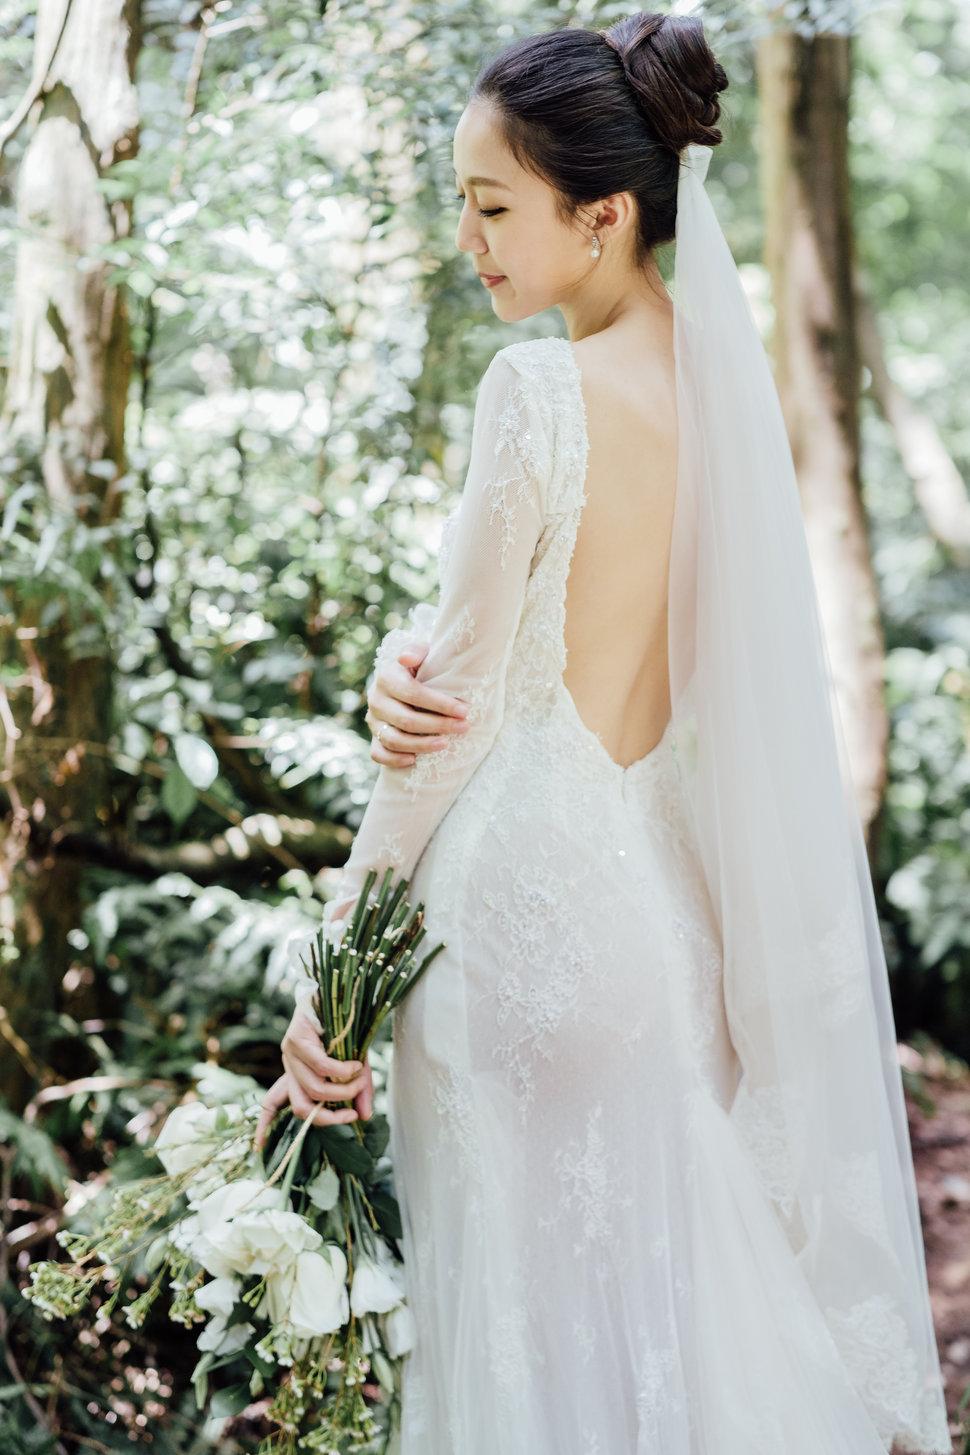 DSCF5045 - Vicky Li 新娘秘書《結婚吧》